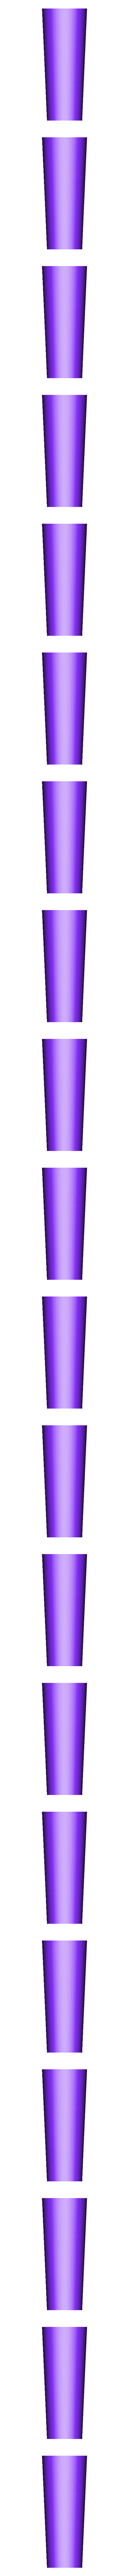 Thumper_body_2.stl Download free STL file Dune Thumper - working • 3D printing design, poblocki1982